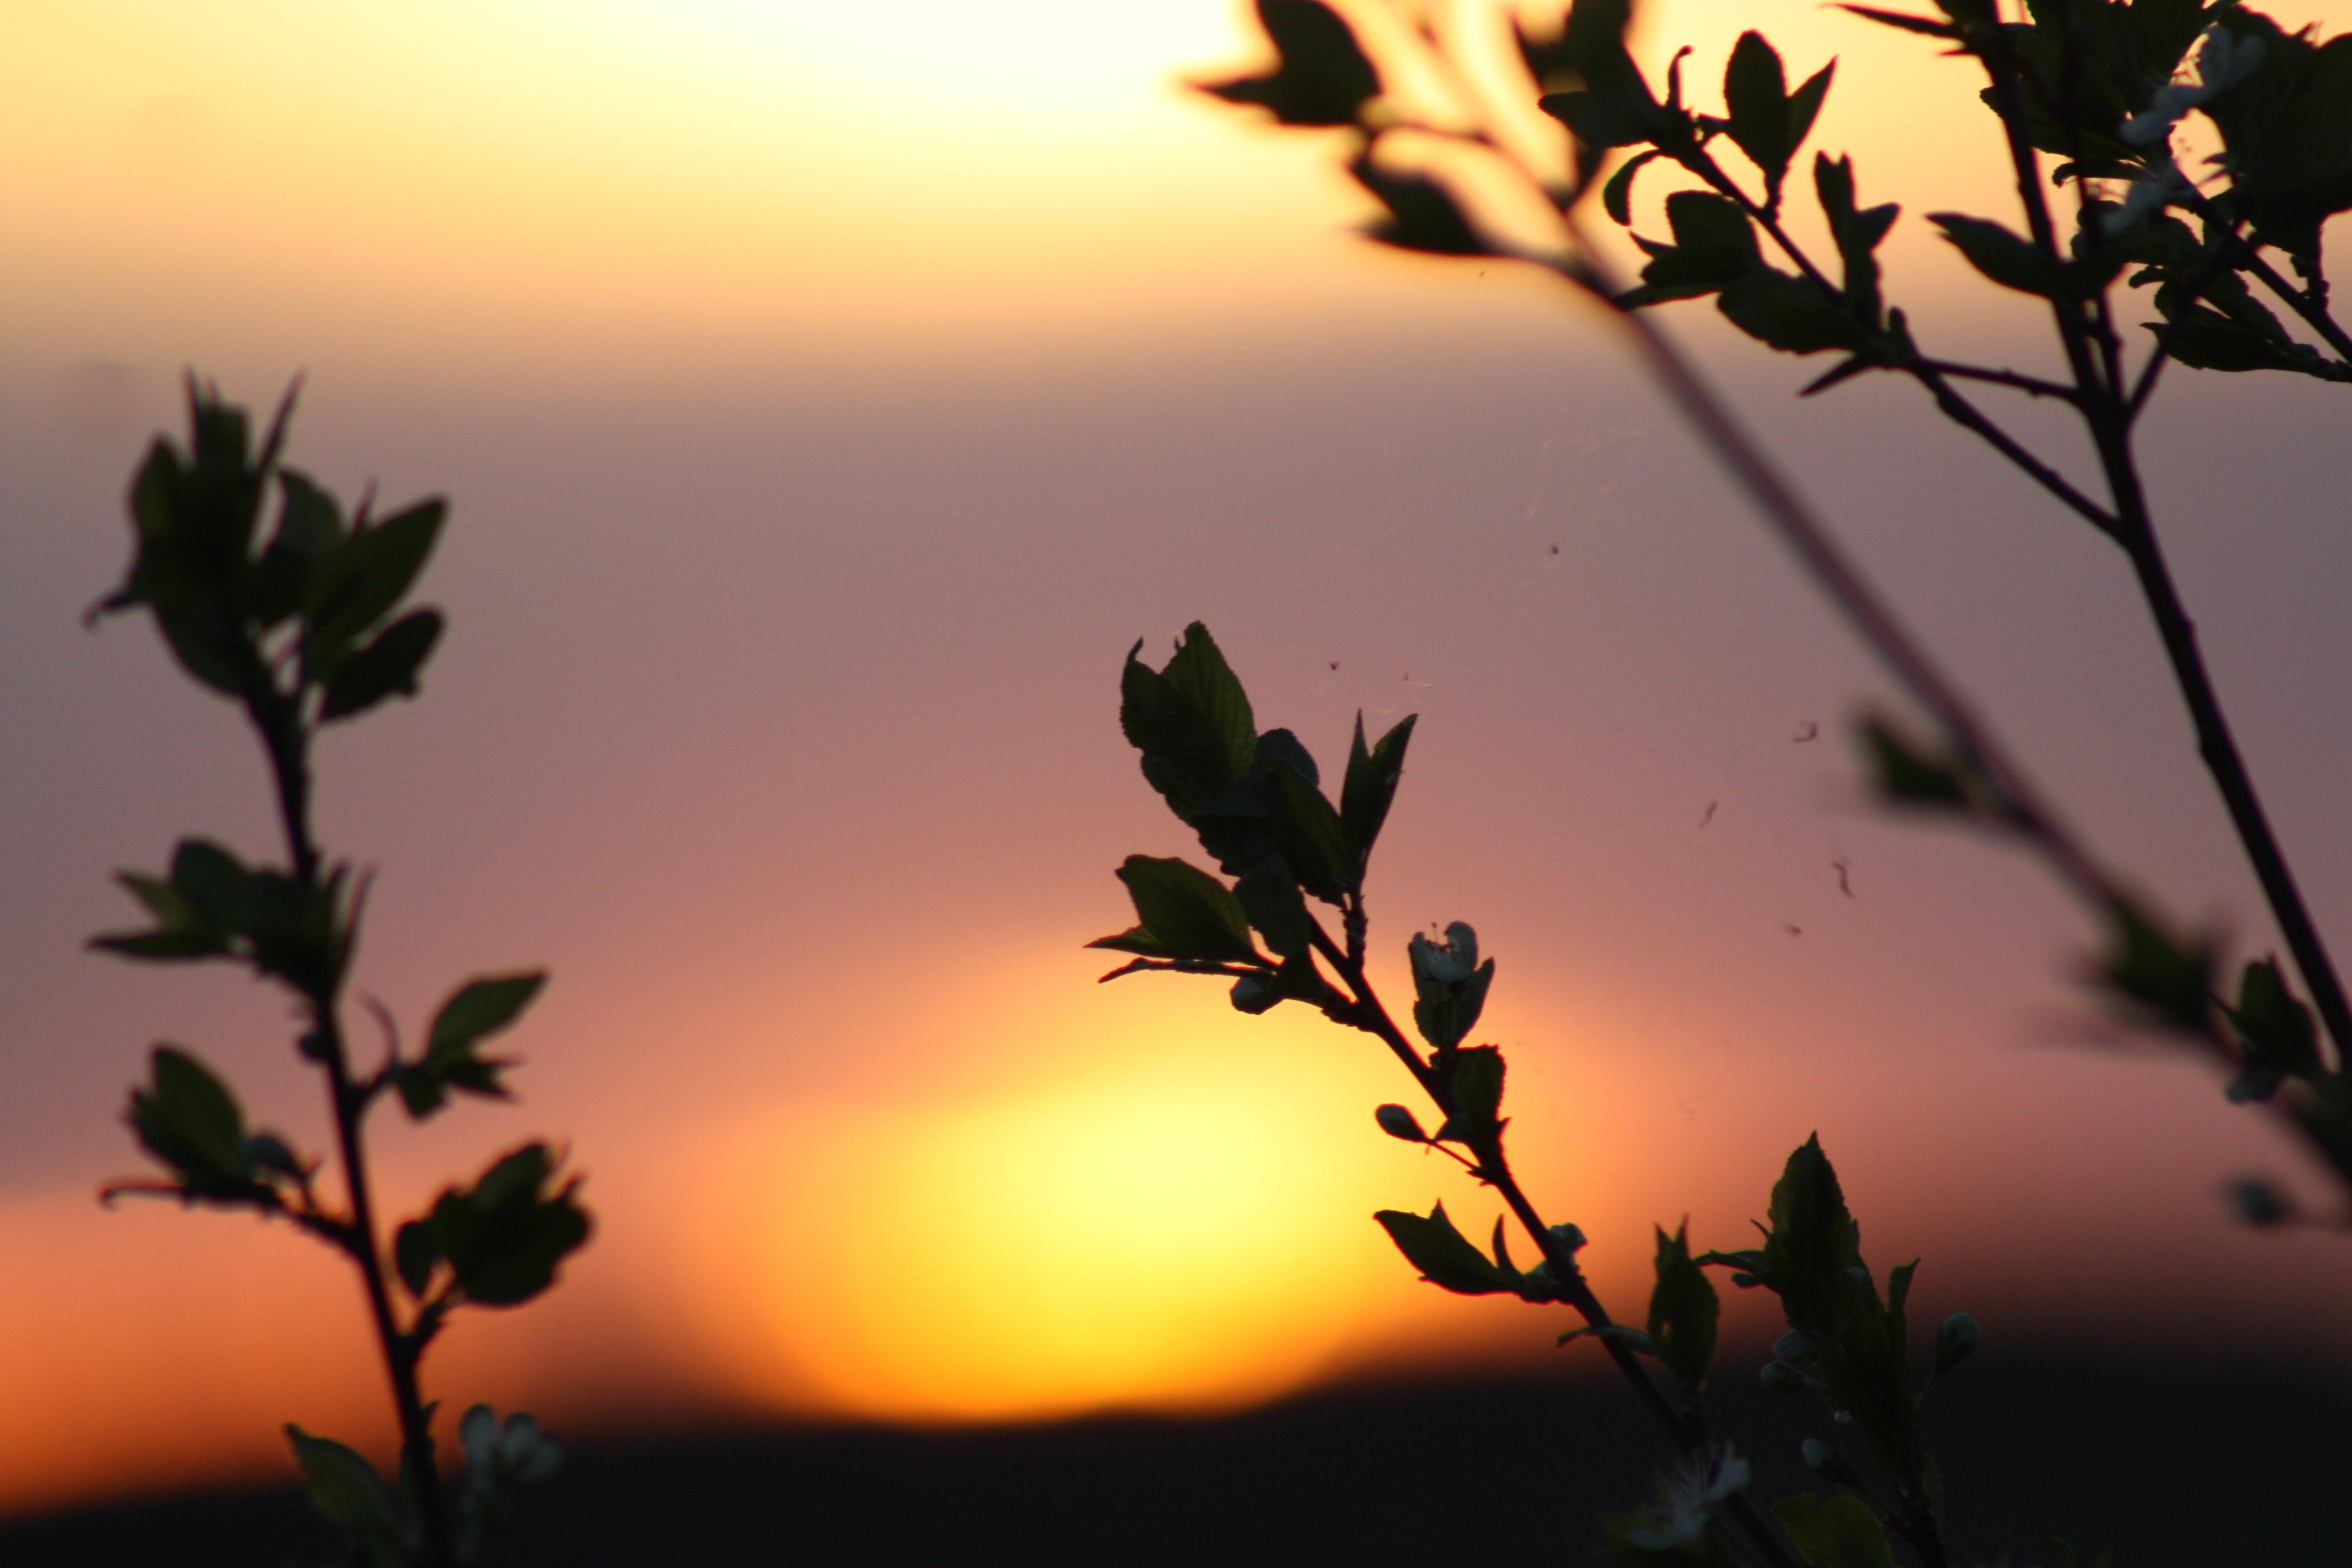 kostenlose foto landschaft baum ast silhouette pflanze himmel sonne sonnenaufgang. Black Bedroom Furniture Sets. Home Design Ideas